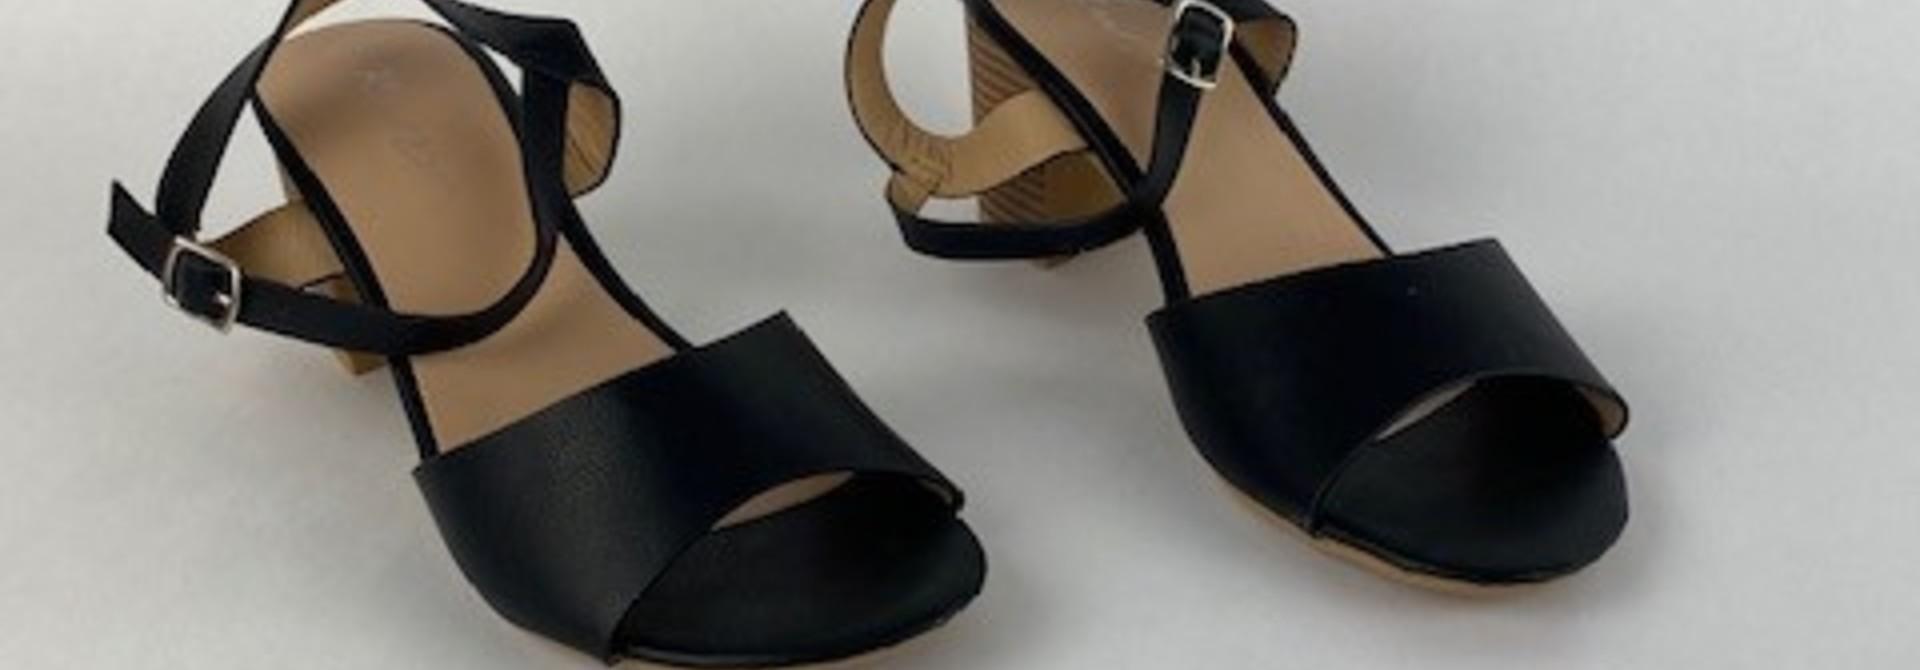 Claretta sandal Black